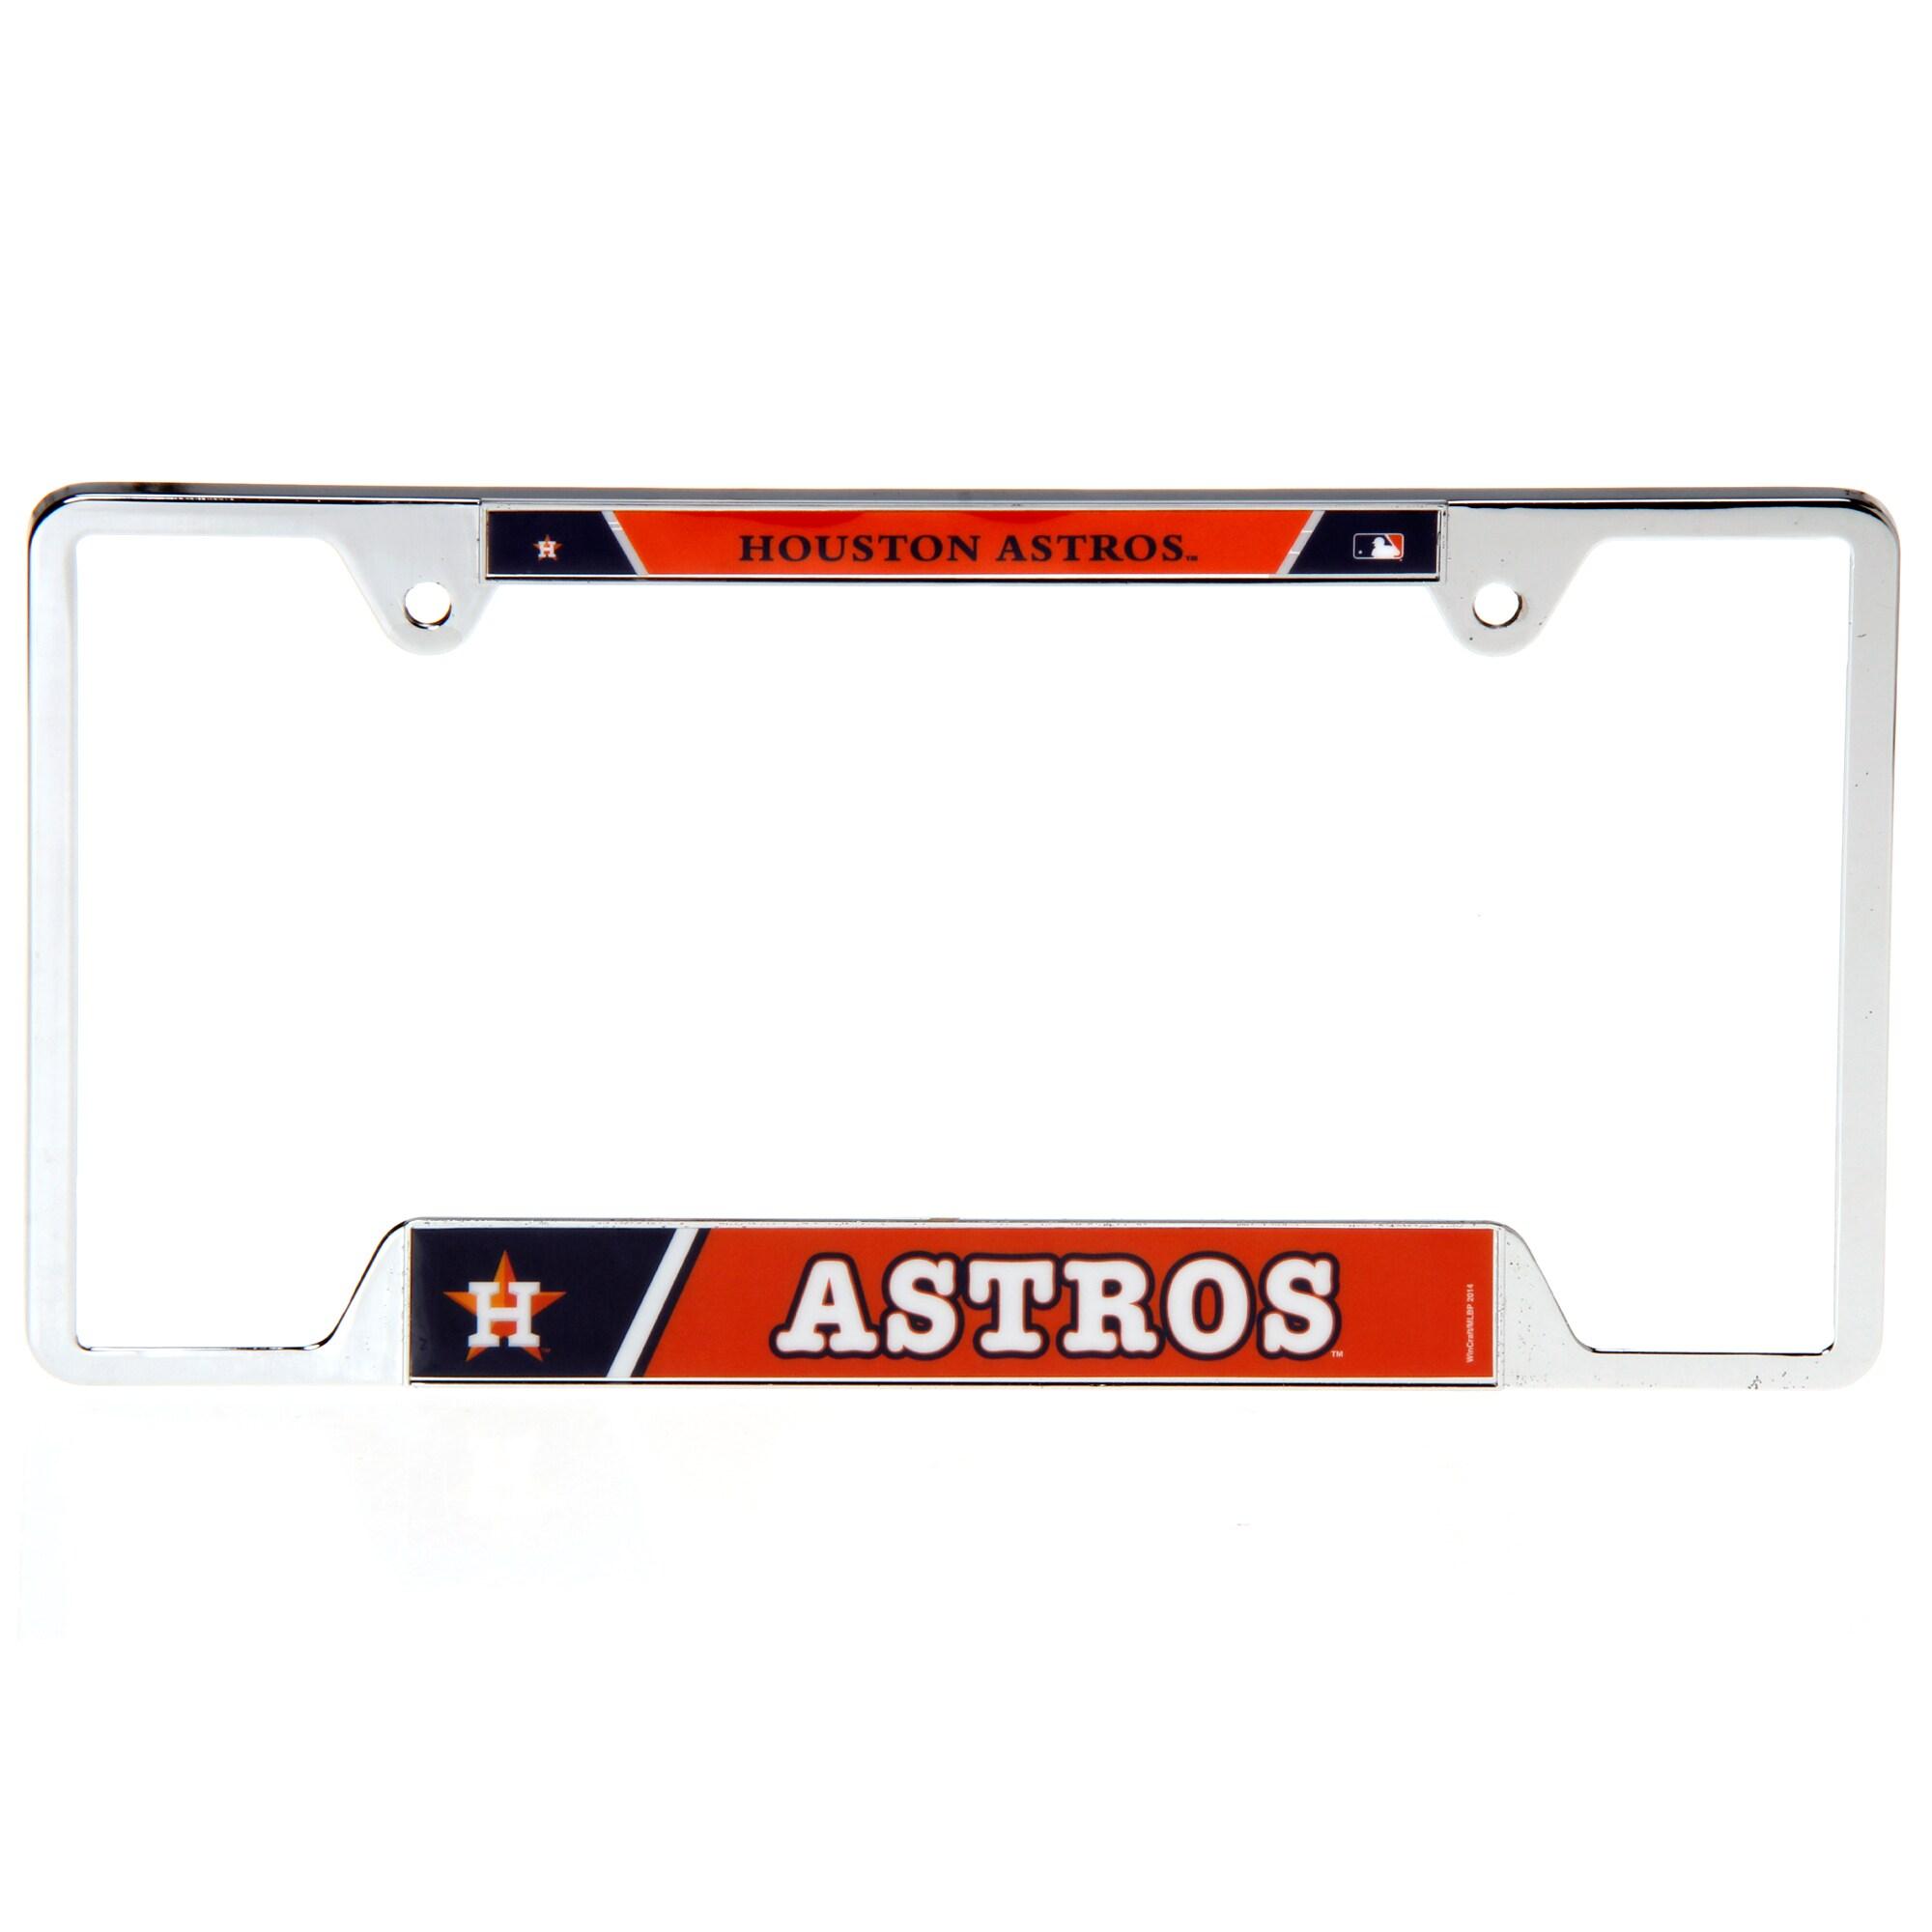 Houston Astros WinCraft Metal License Plate Frame